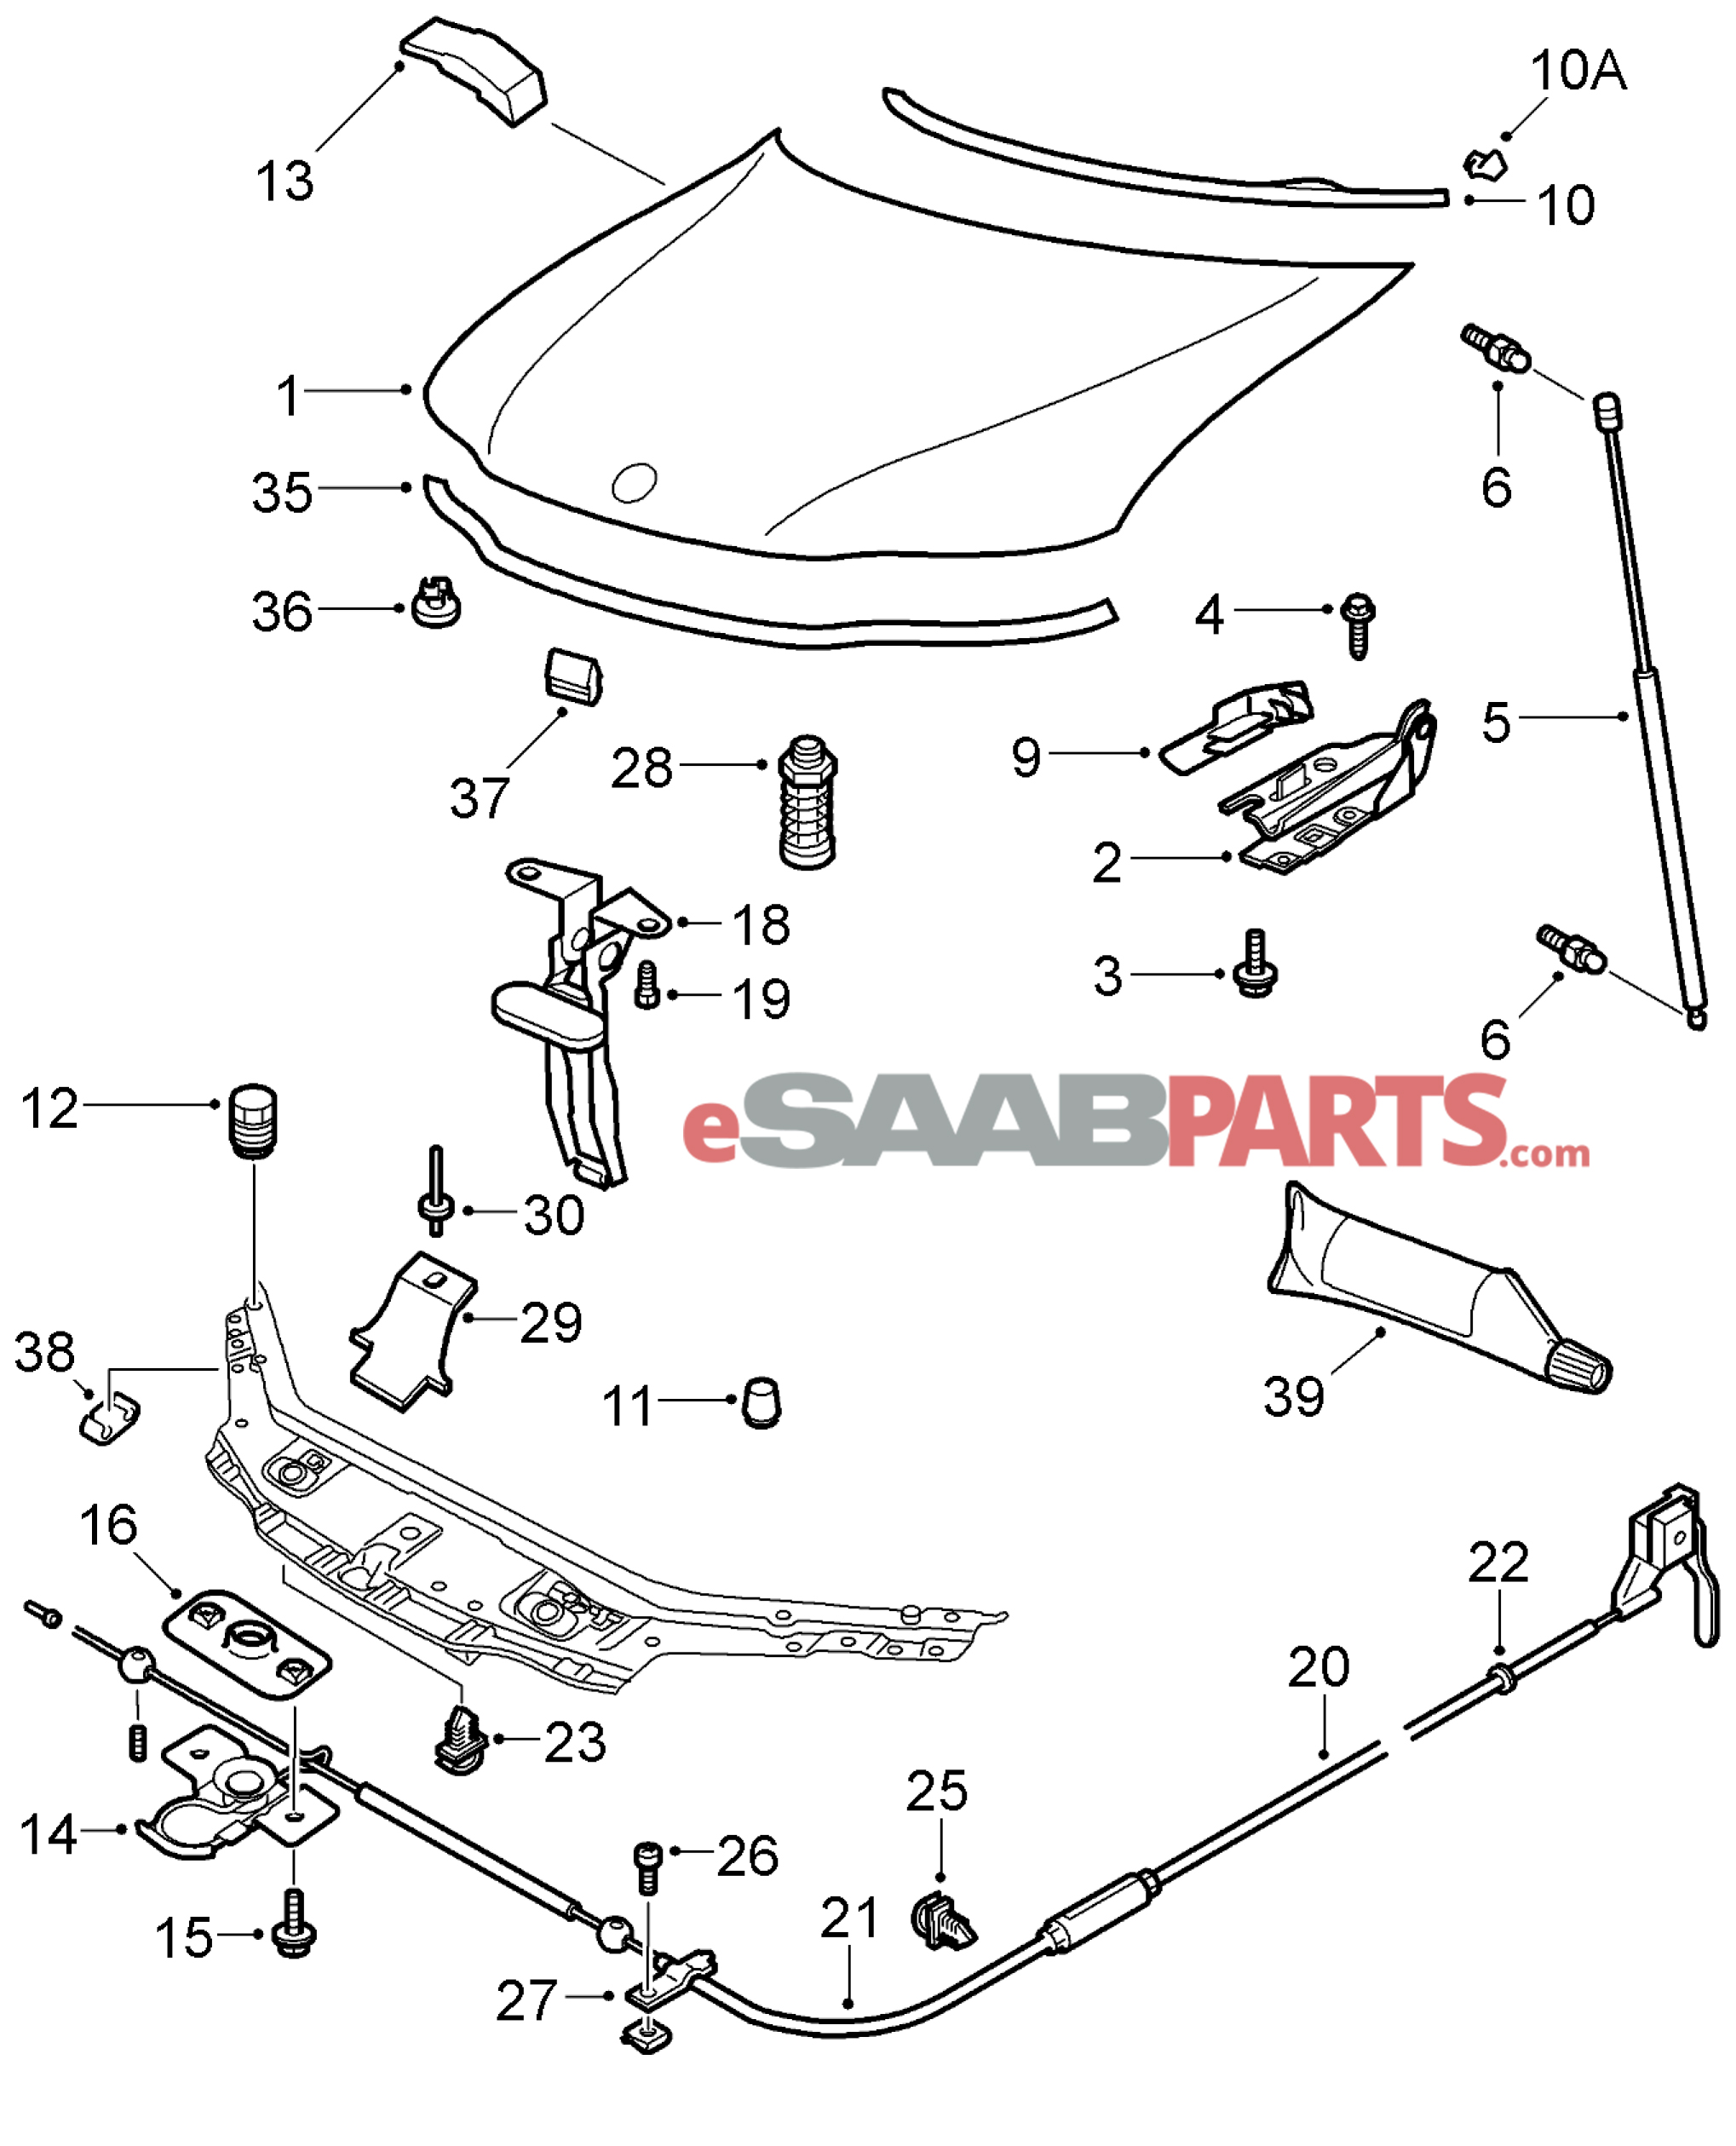 1997 saab 900 convertible wiring diagram database. Black Bedroom Furniture Sets. Home Design Ideas